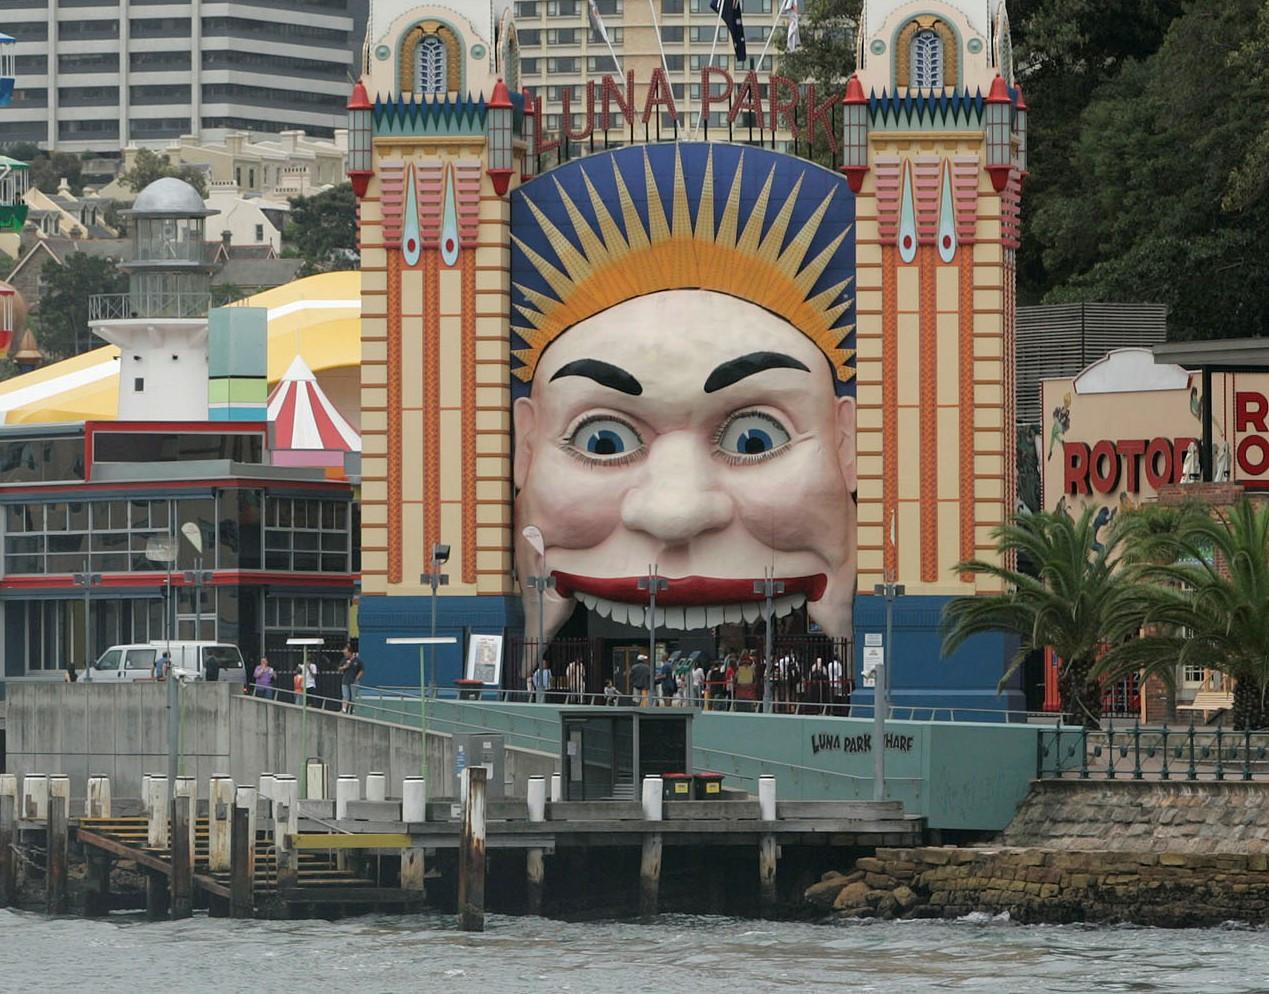 Mum calls out theme park over 'vile' racist artwork